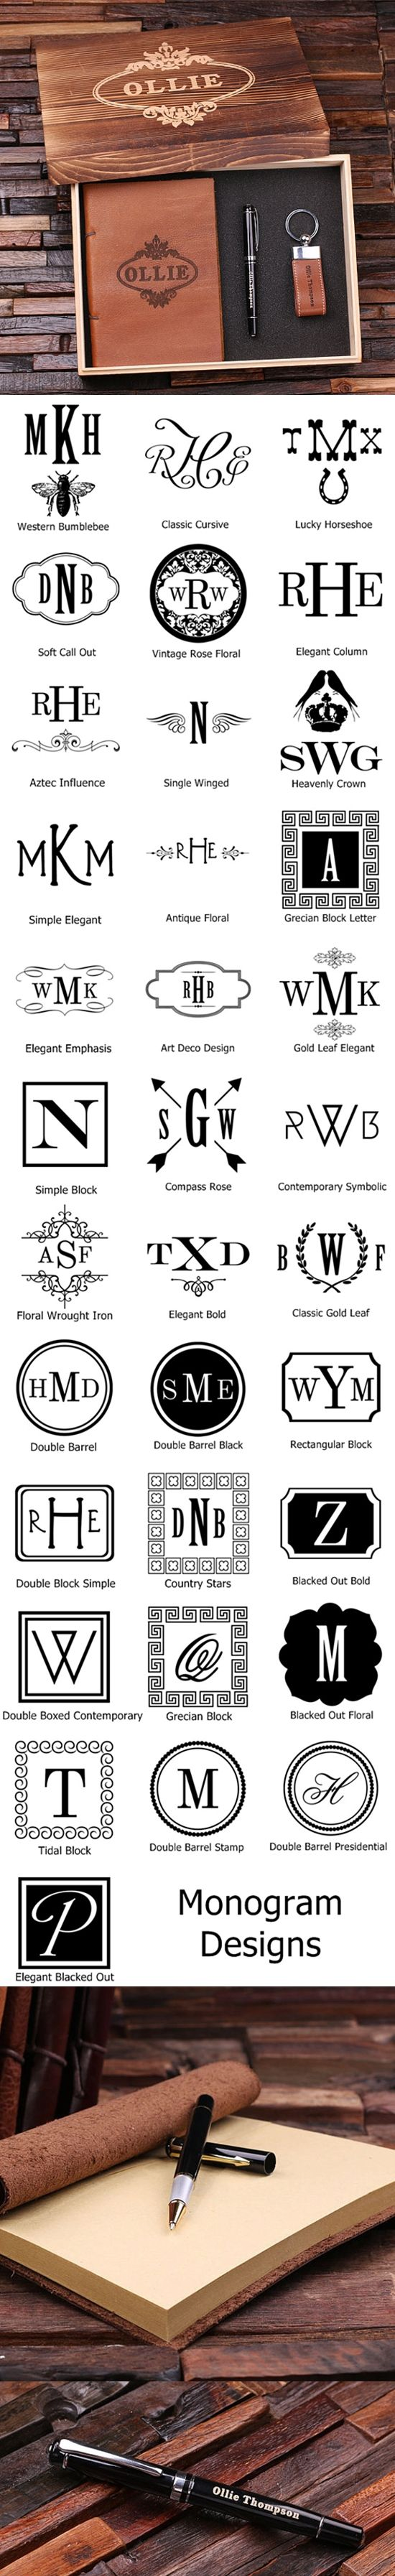 22 best Name Engraved pen/pencil images on Pinterest   Engraved pens ...